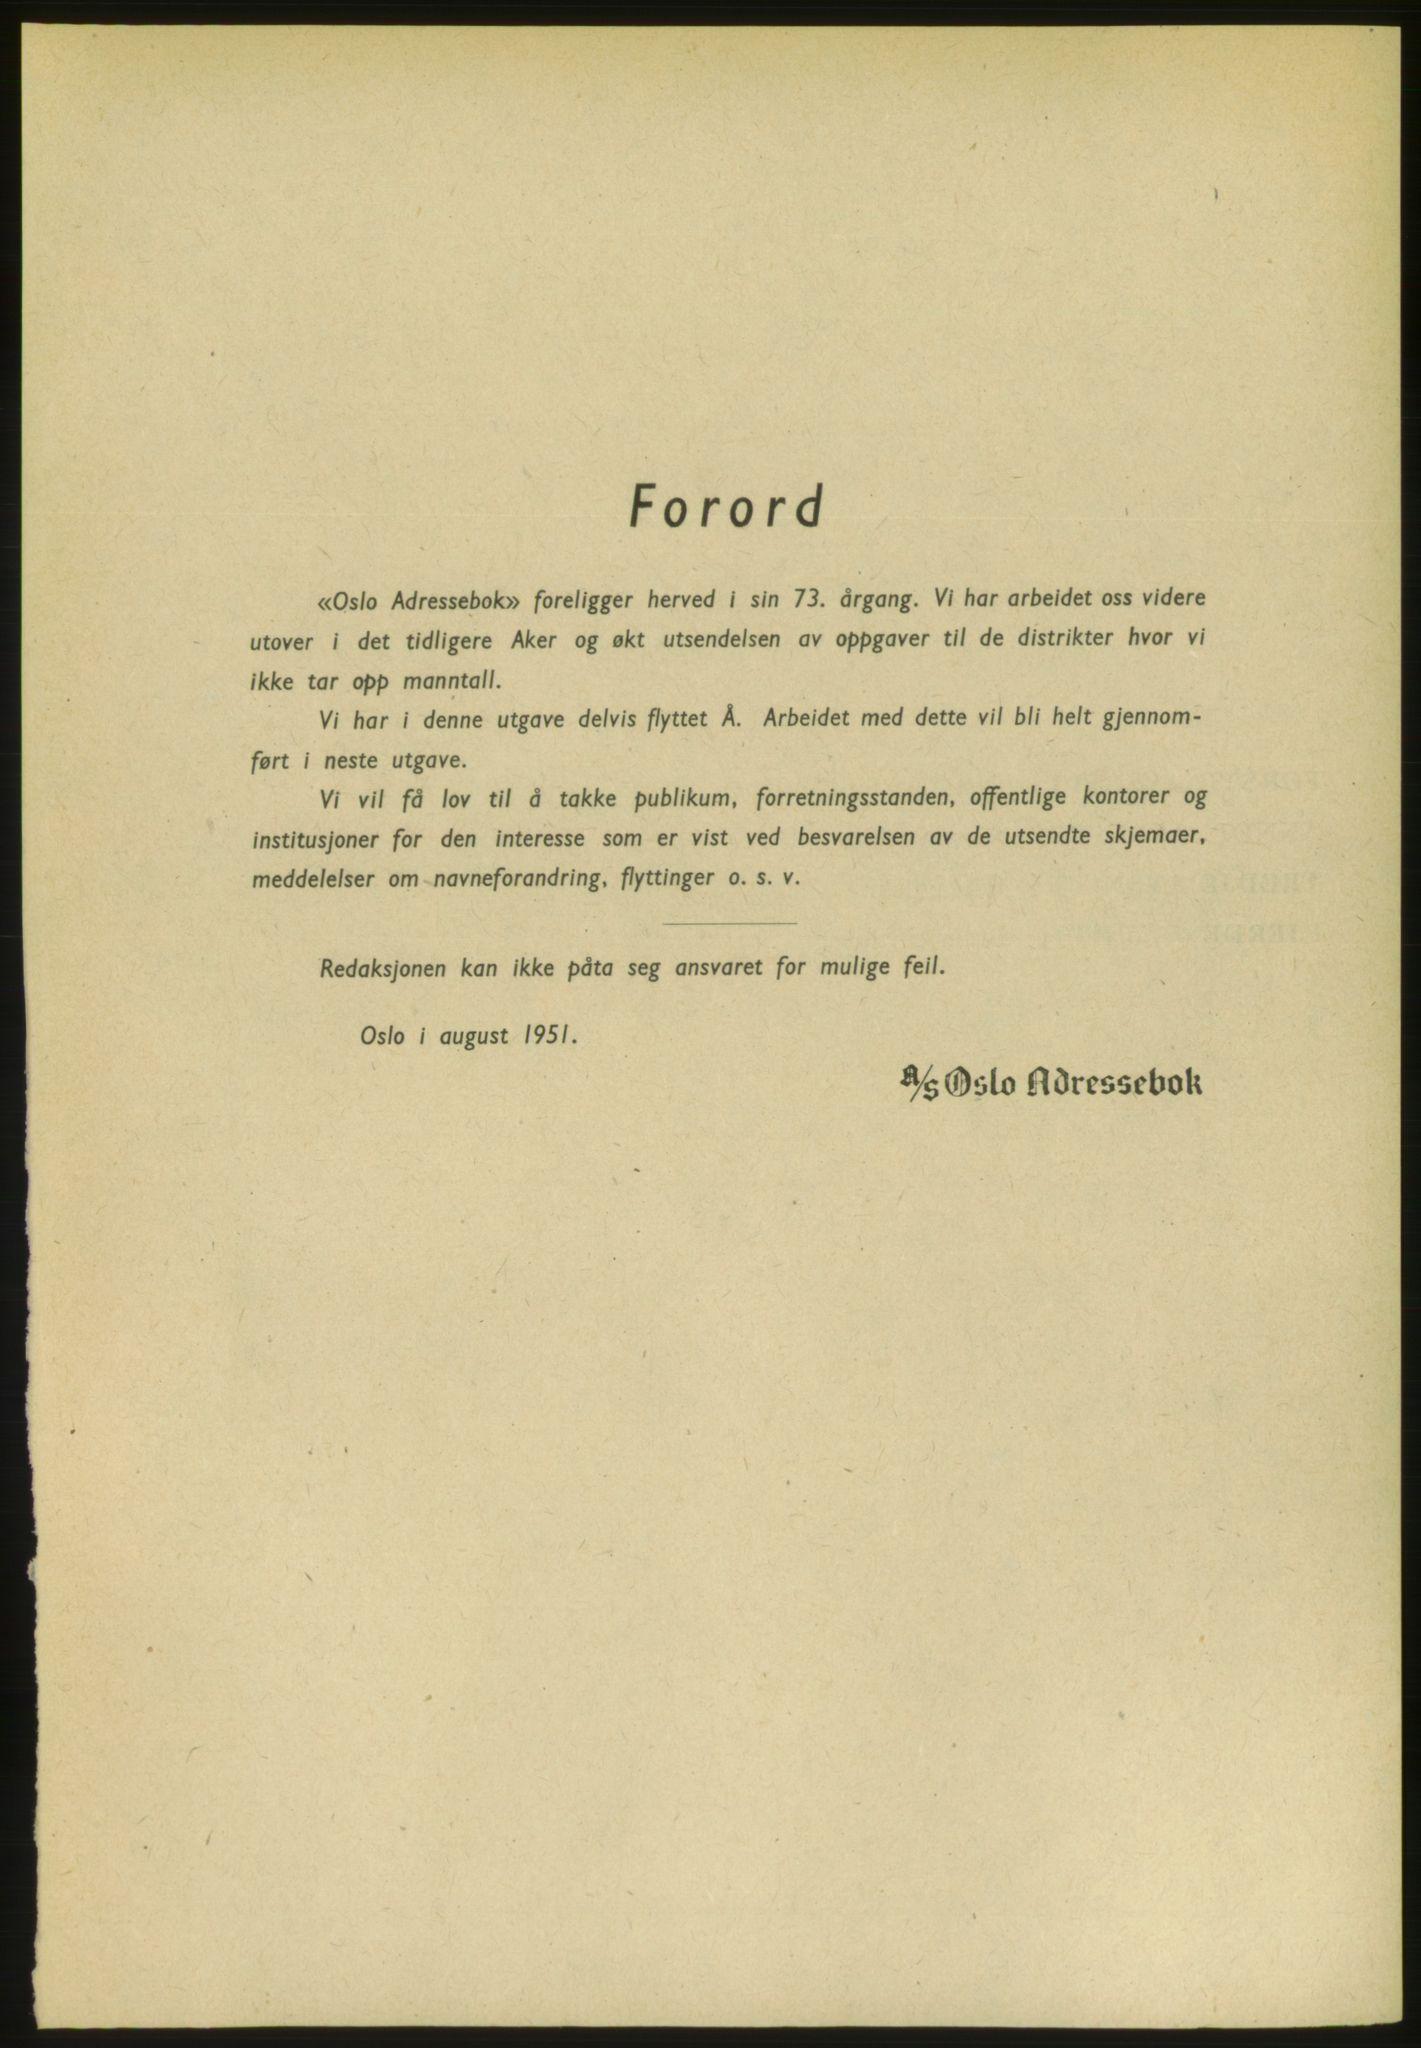 PUBL, Kristiania/Oslo adressebok, 1951